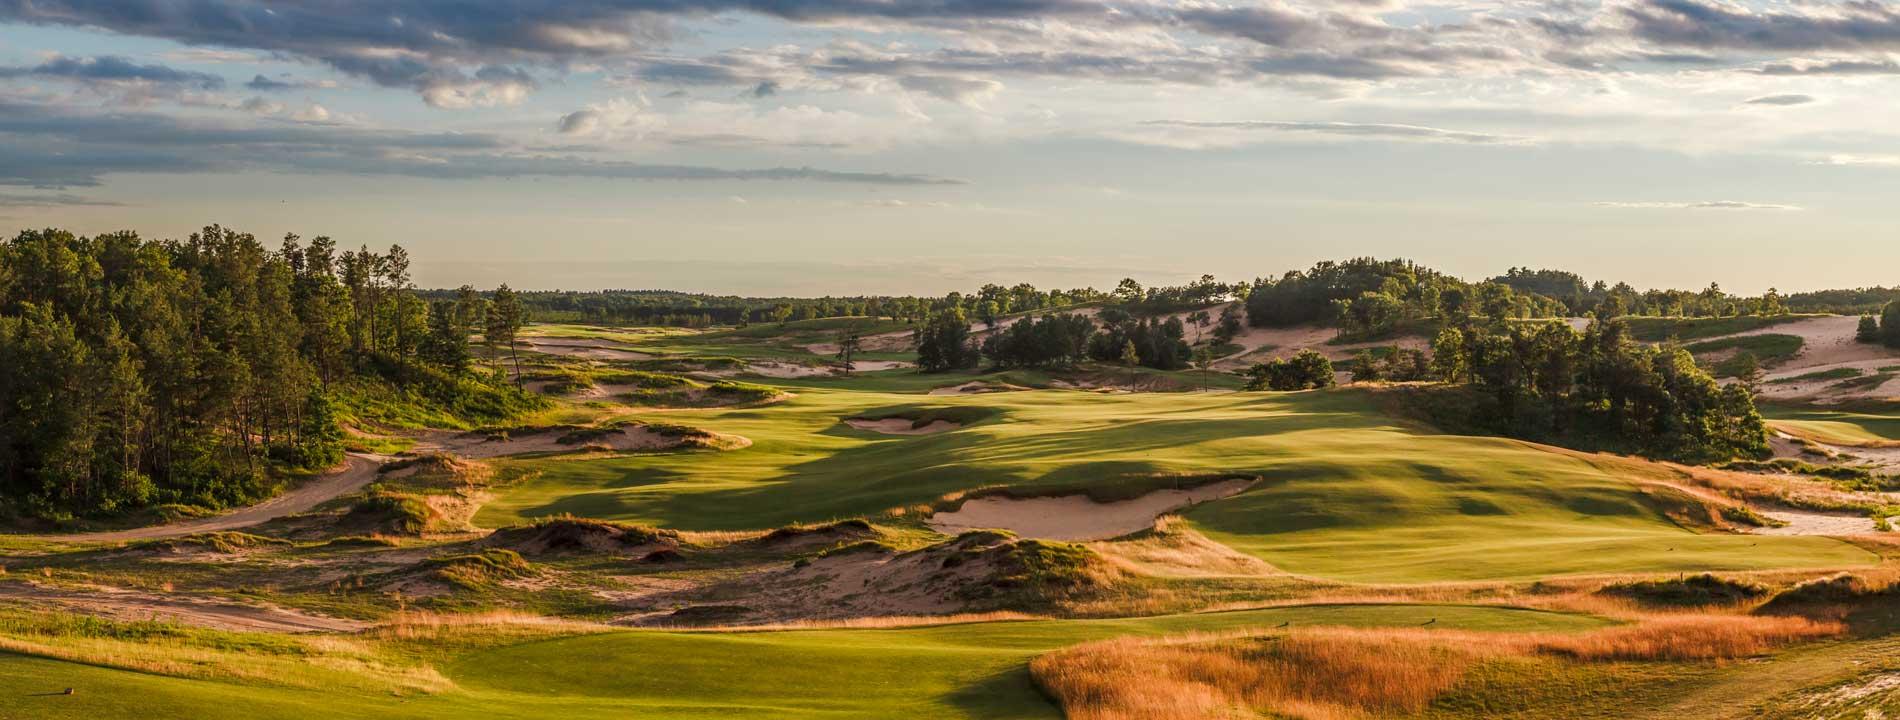 Sand Valley Golf Resort opened in 2017.